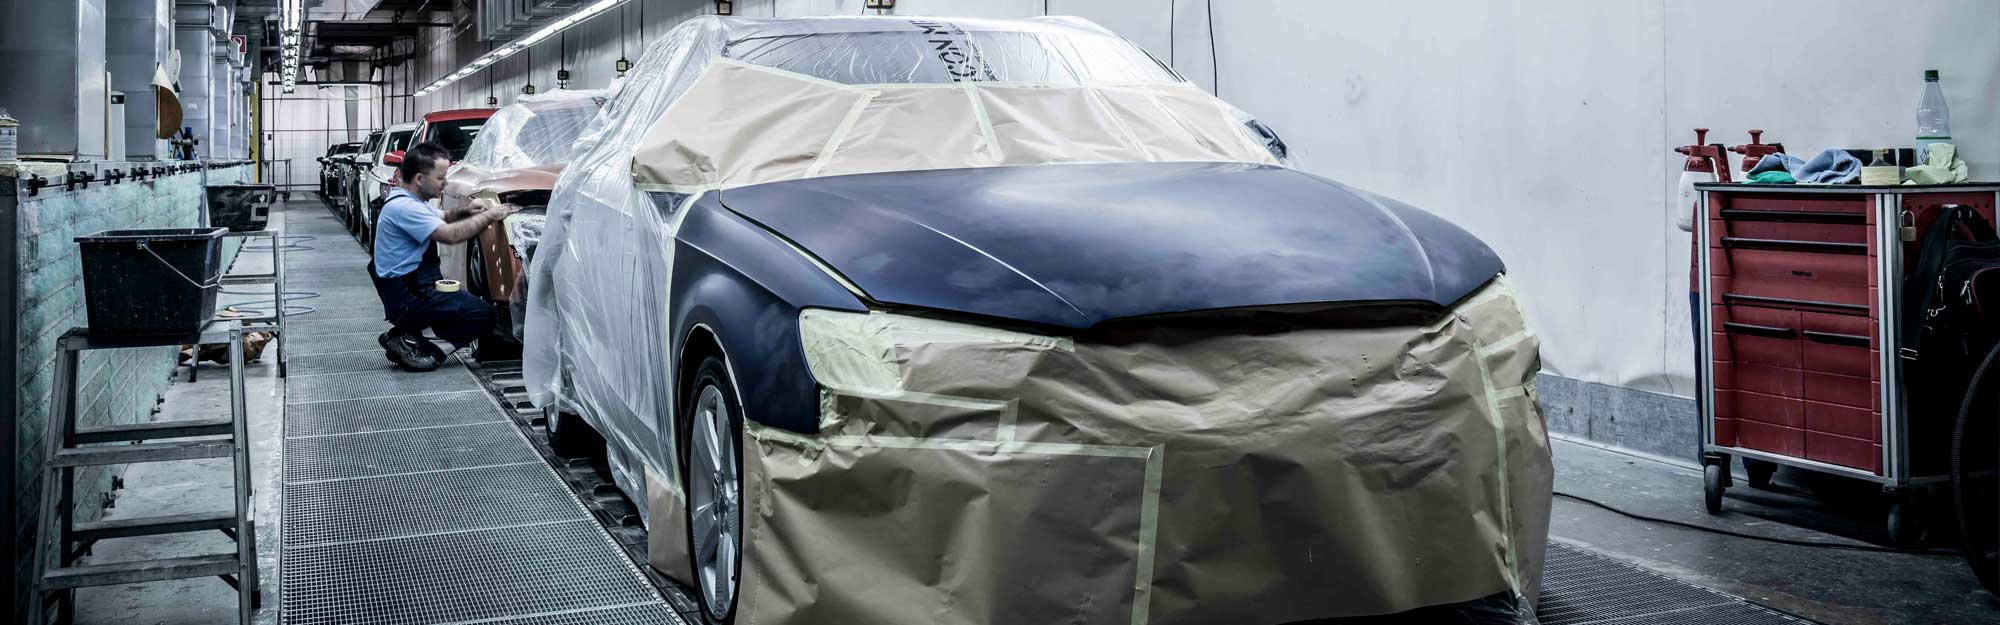 Fahrzeuglackierung / Autolackierung / Lack Aufbereitung